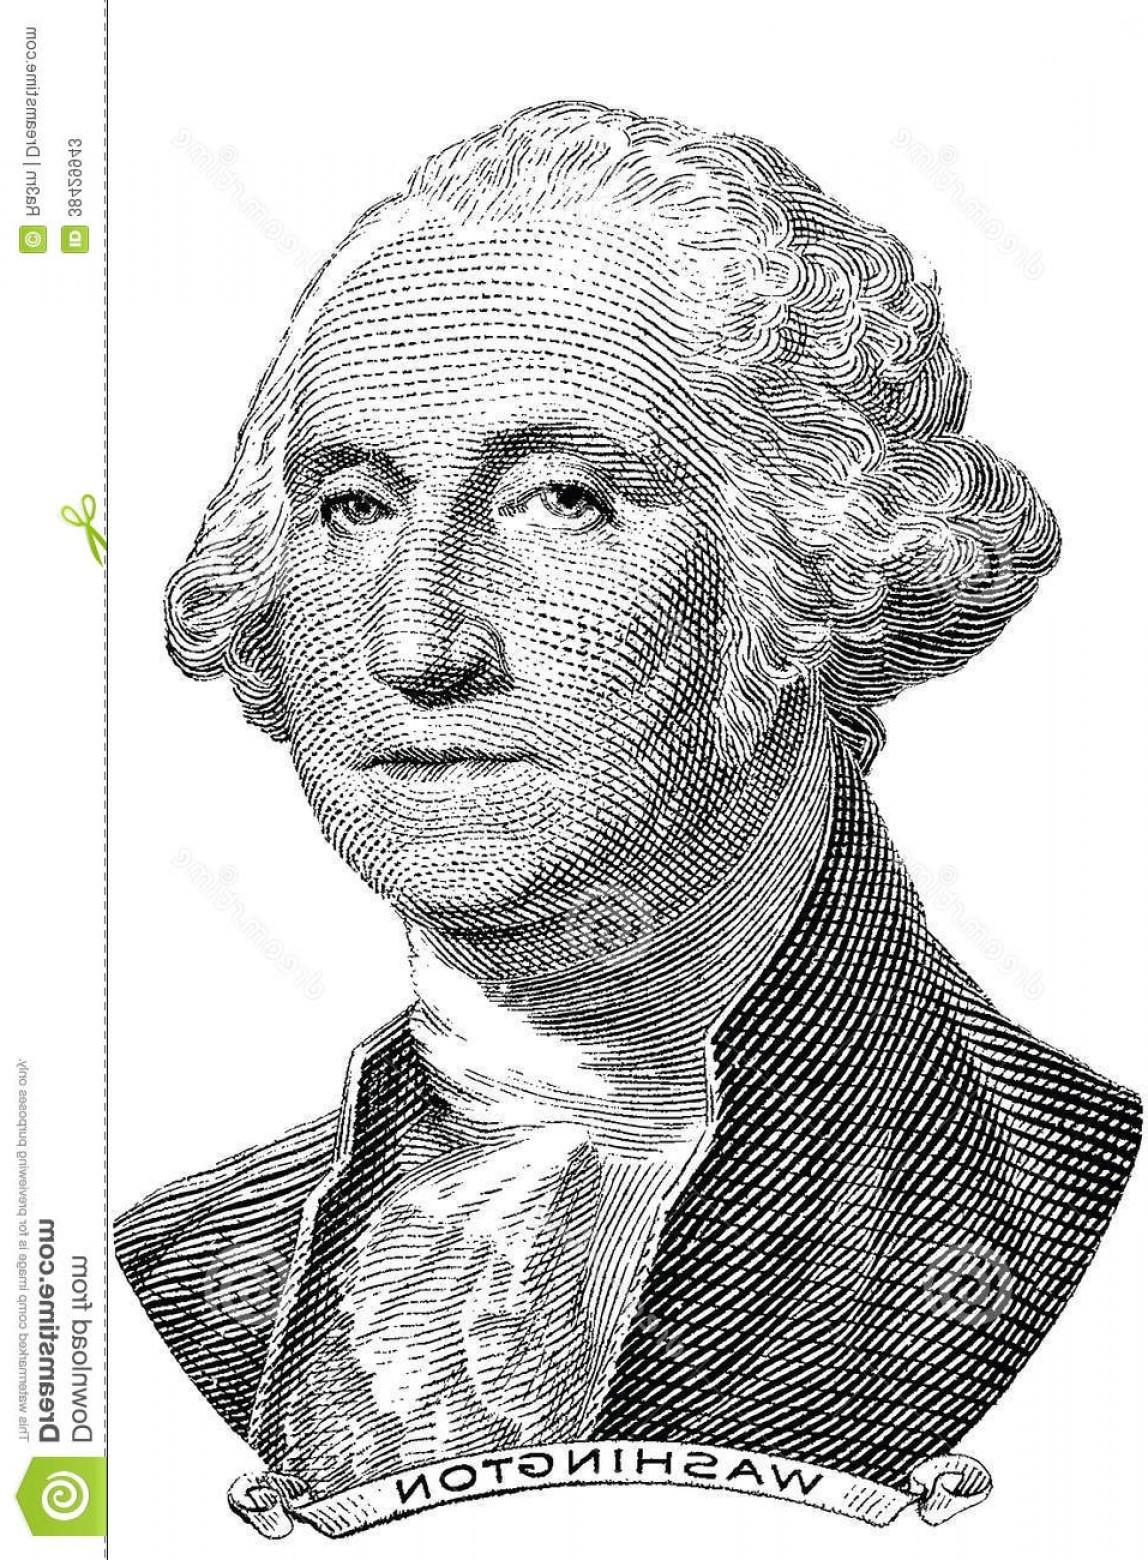 1148x1560 Stock Photos George Washington Vector Image Geekchicpro